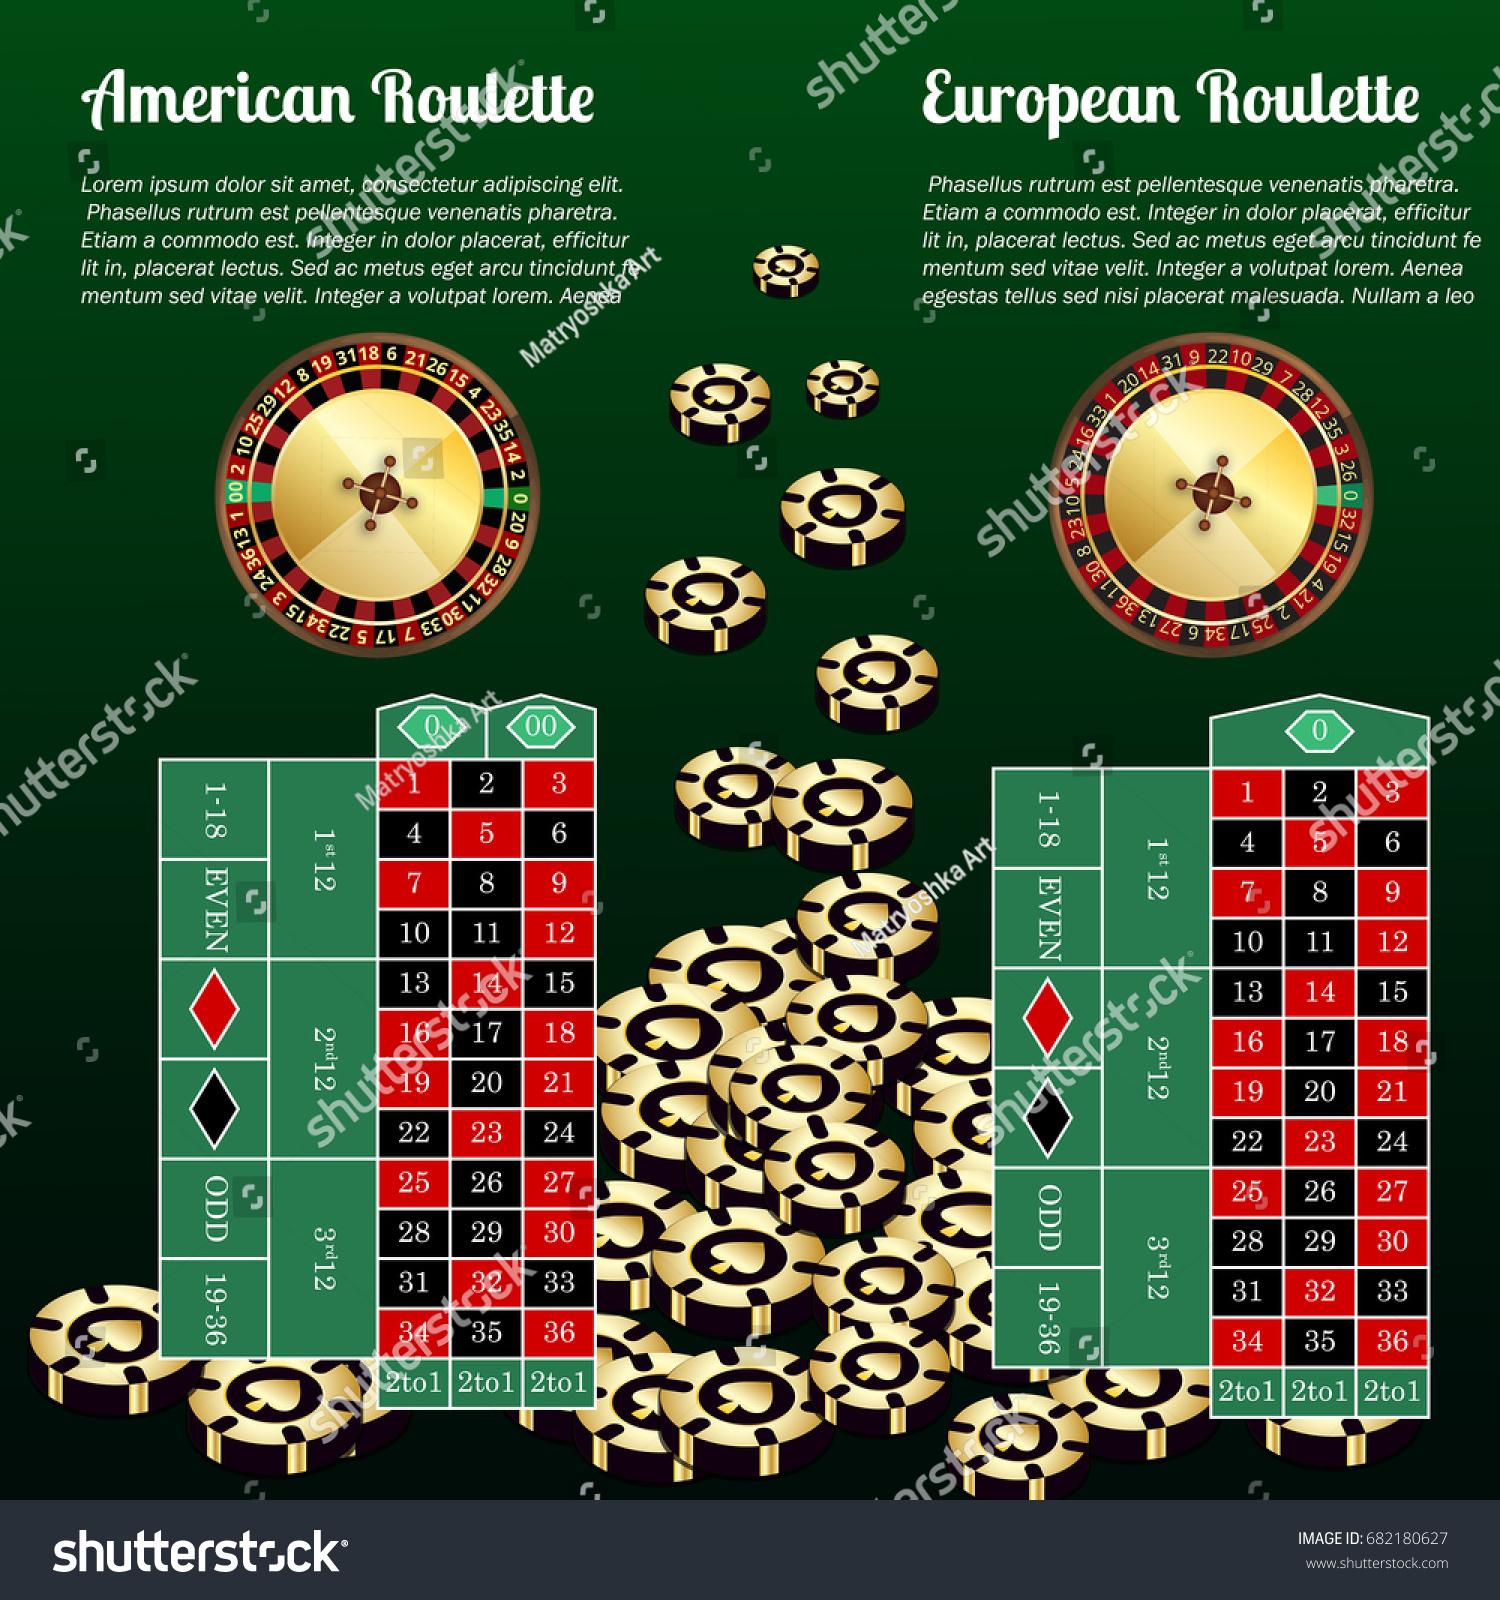 Slots on an american roulette wheel no deposite bonus codes